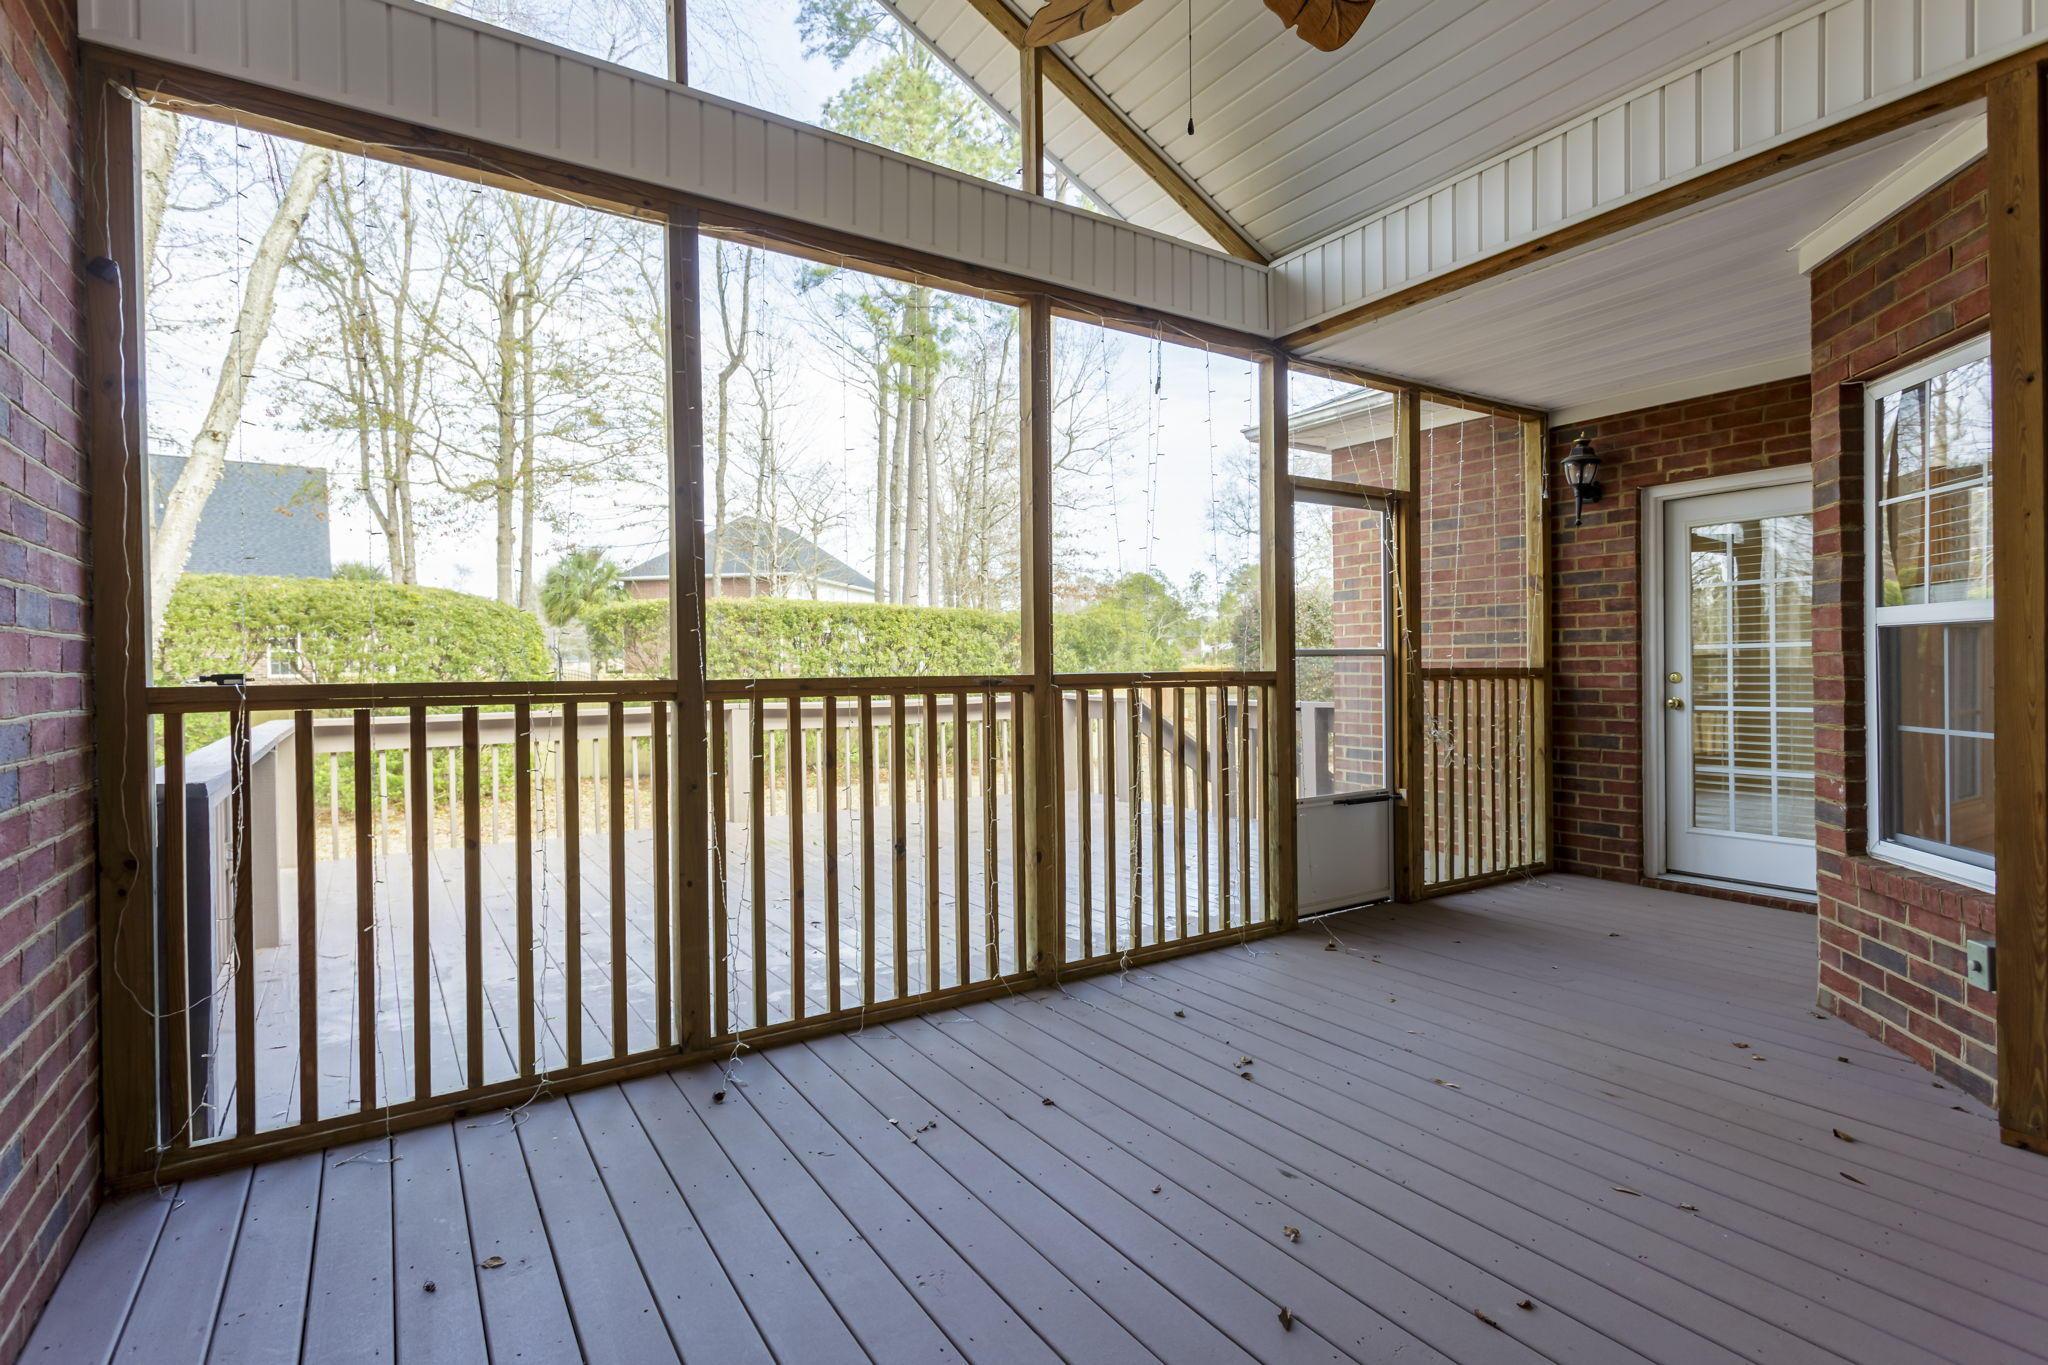 Crowfield Plantation Homes For Sale - 111 Thames, Goose Creek, SC - 23